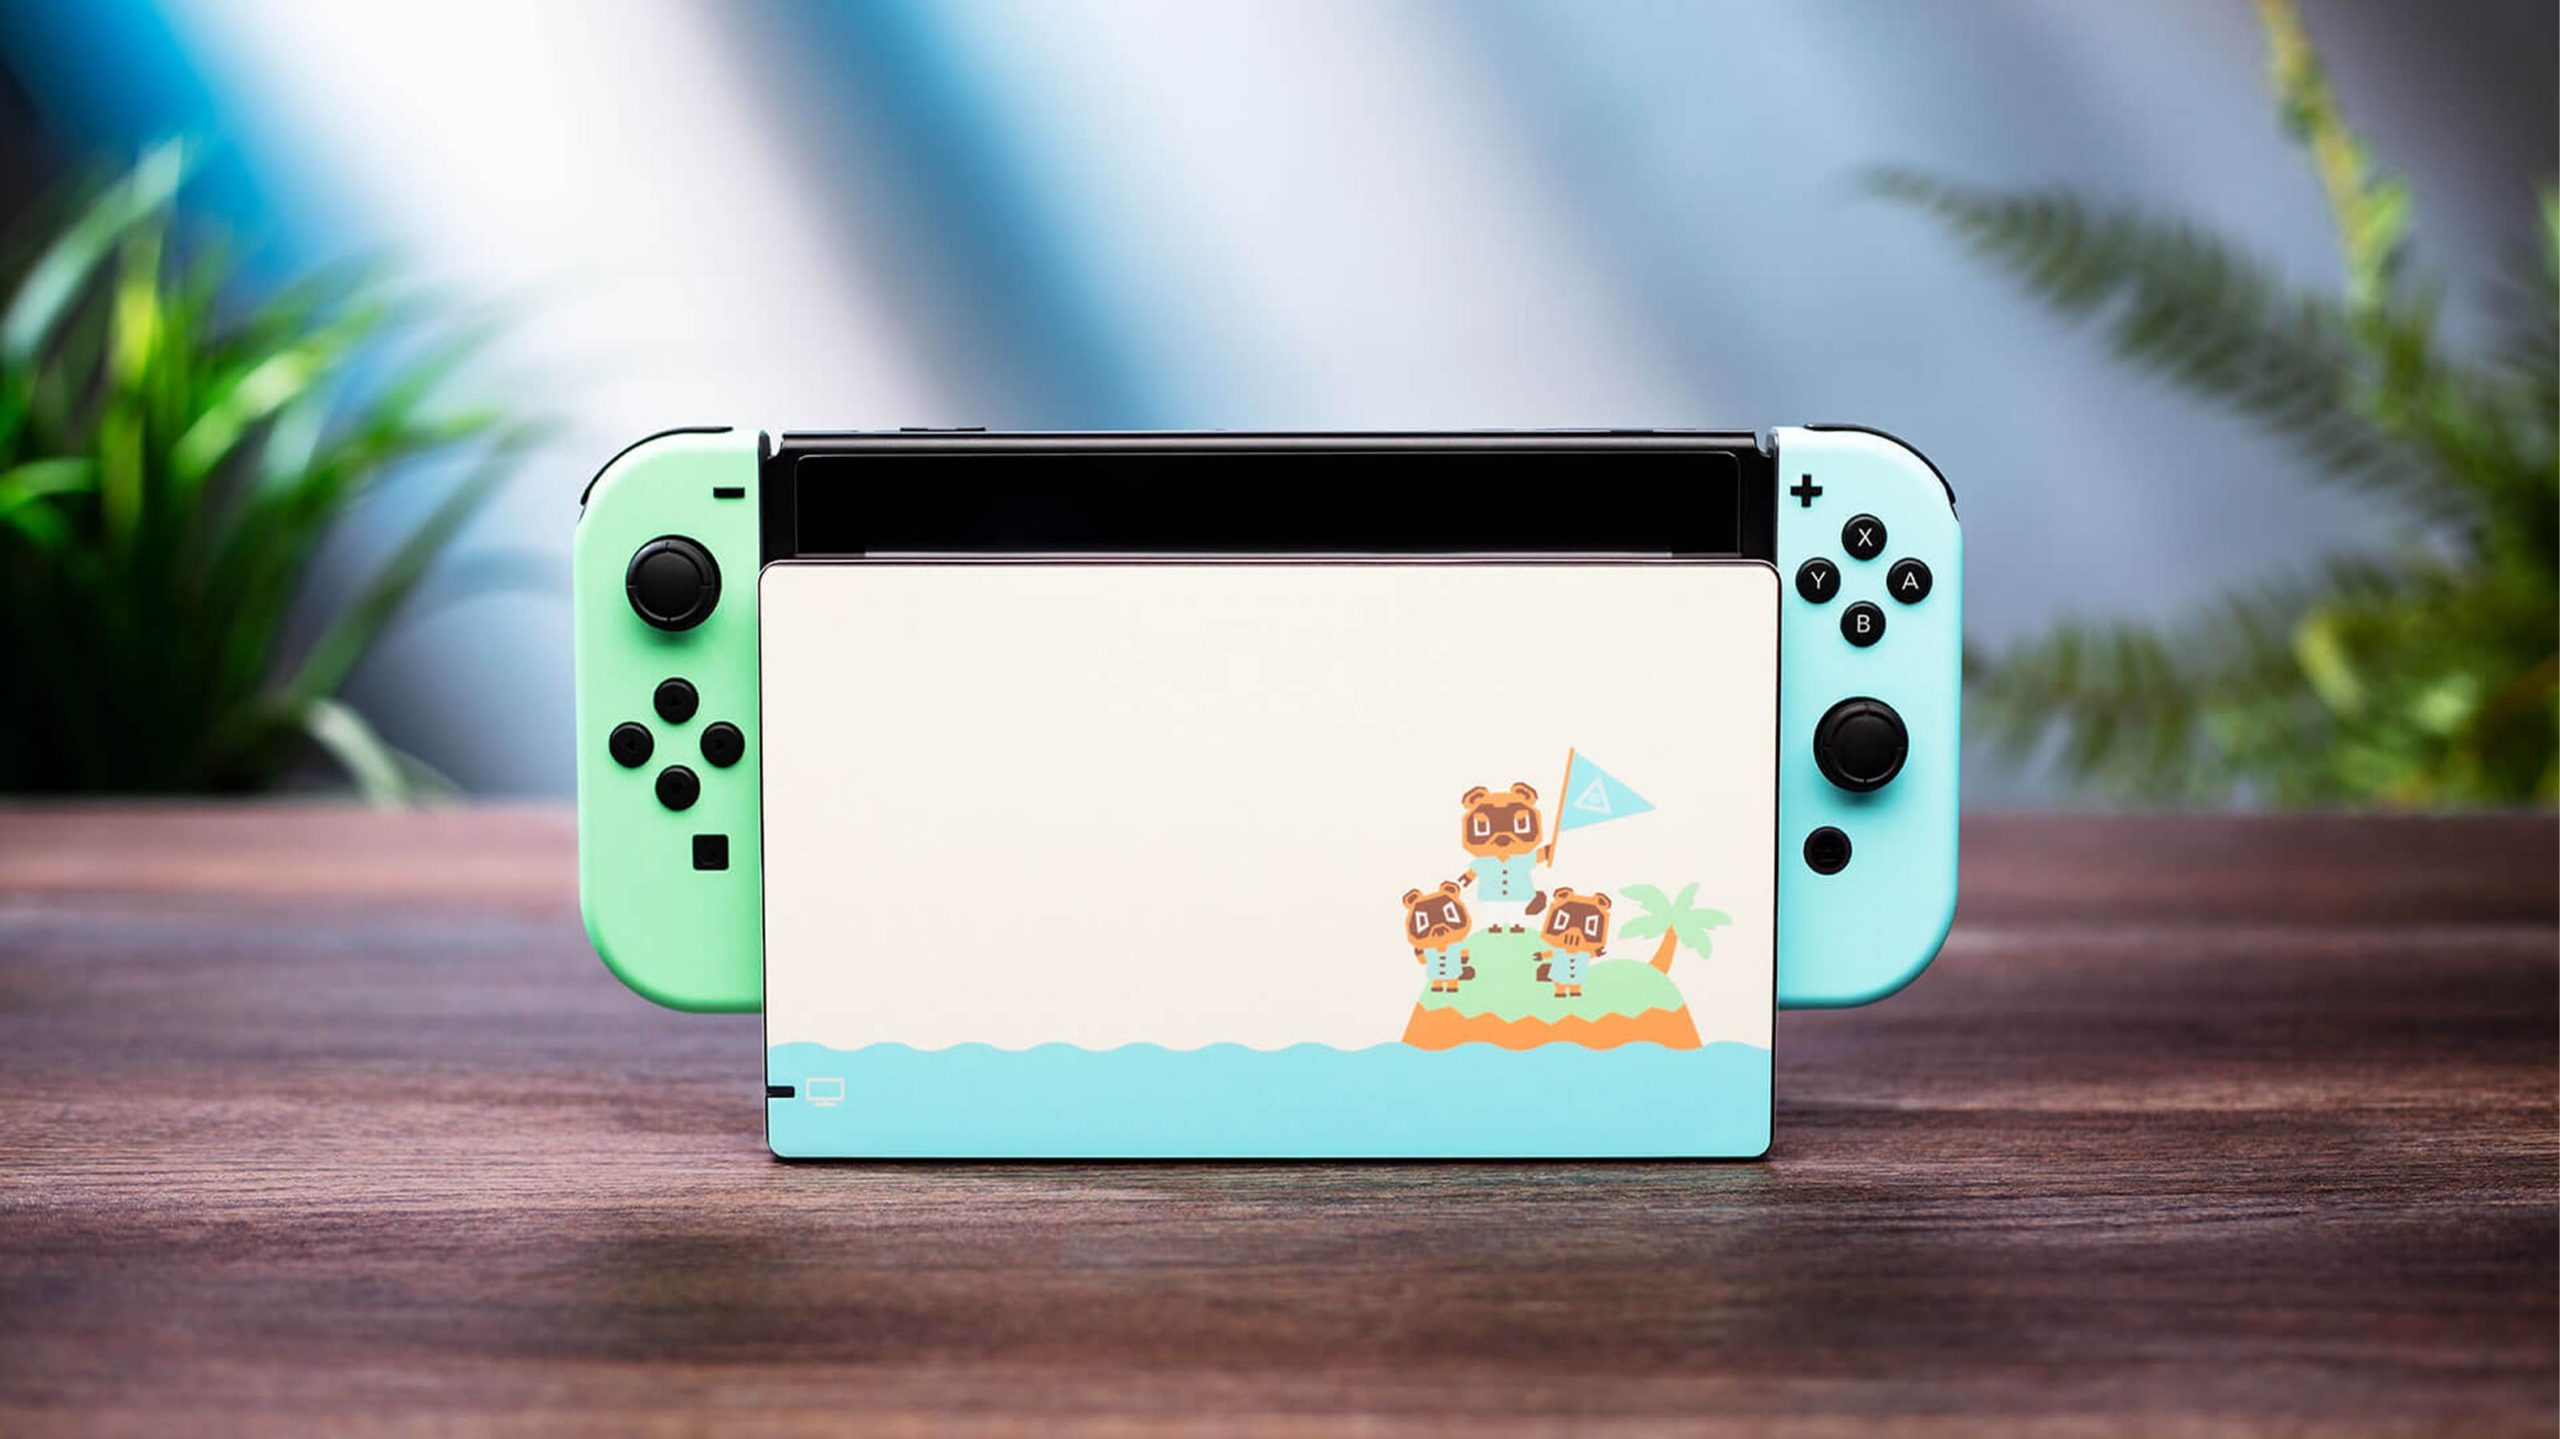 '(not) Animal Crossing' Switch skin